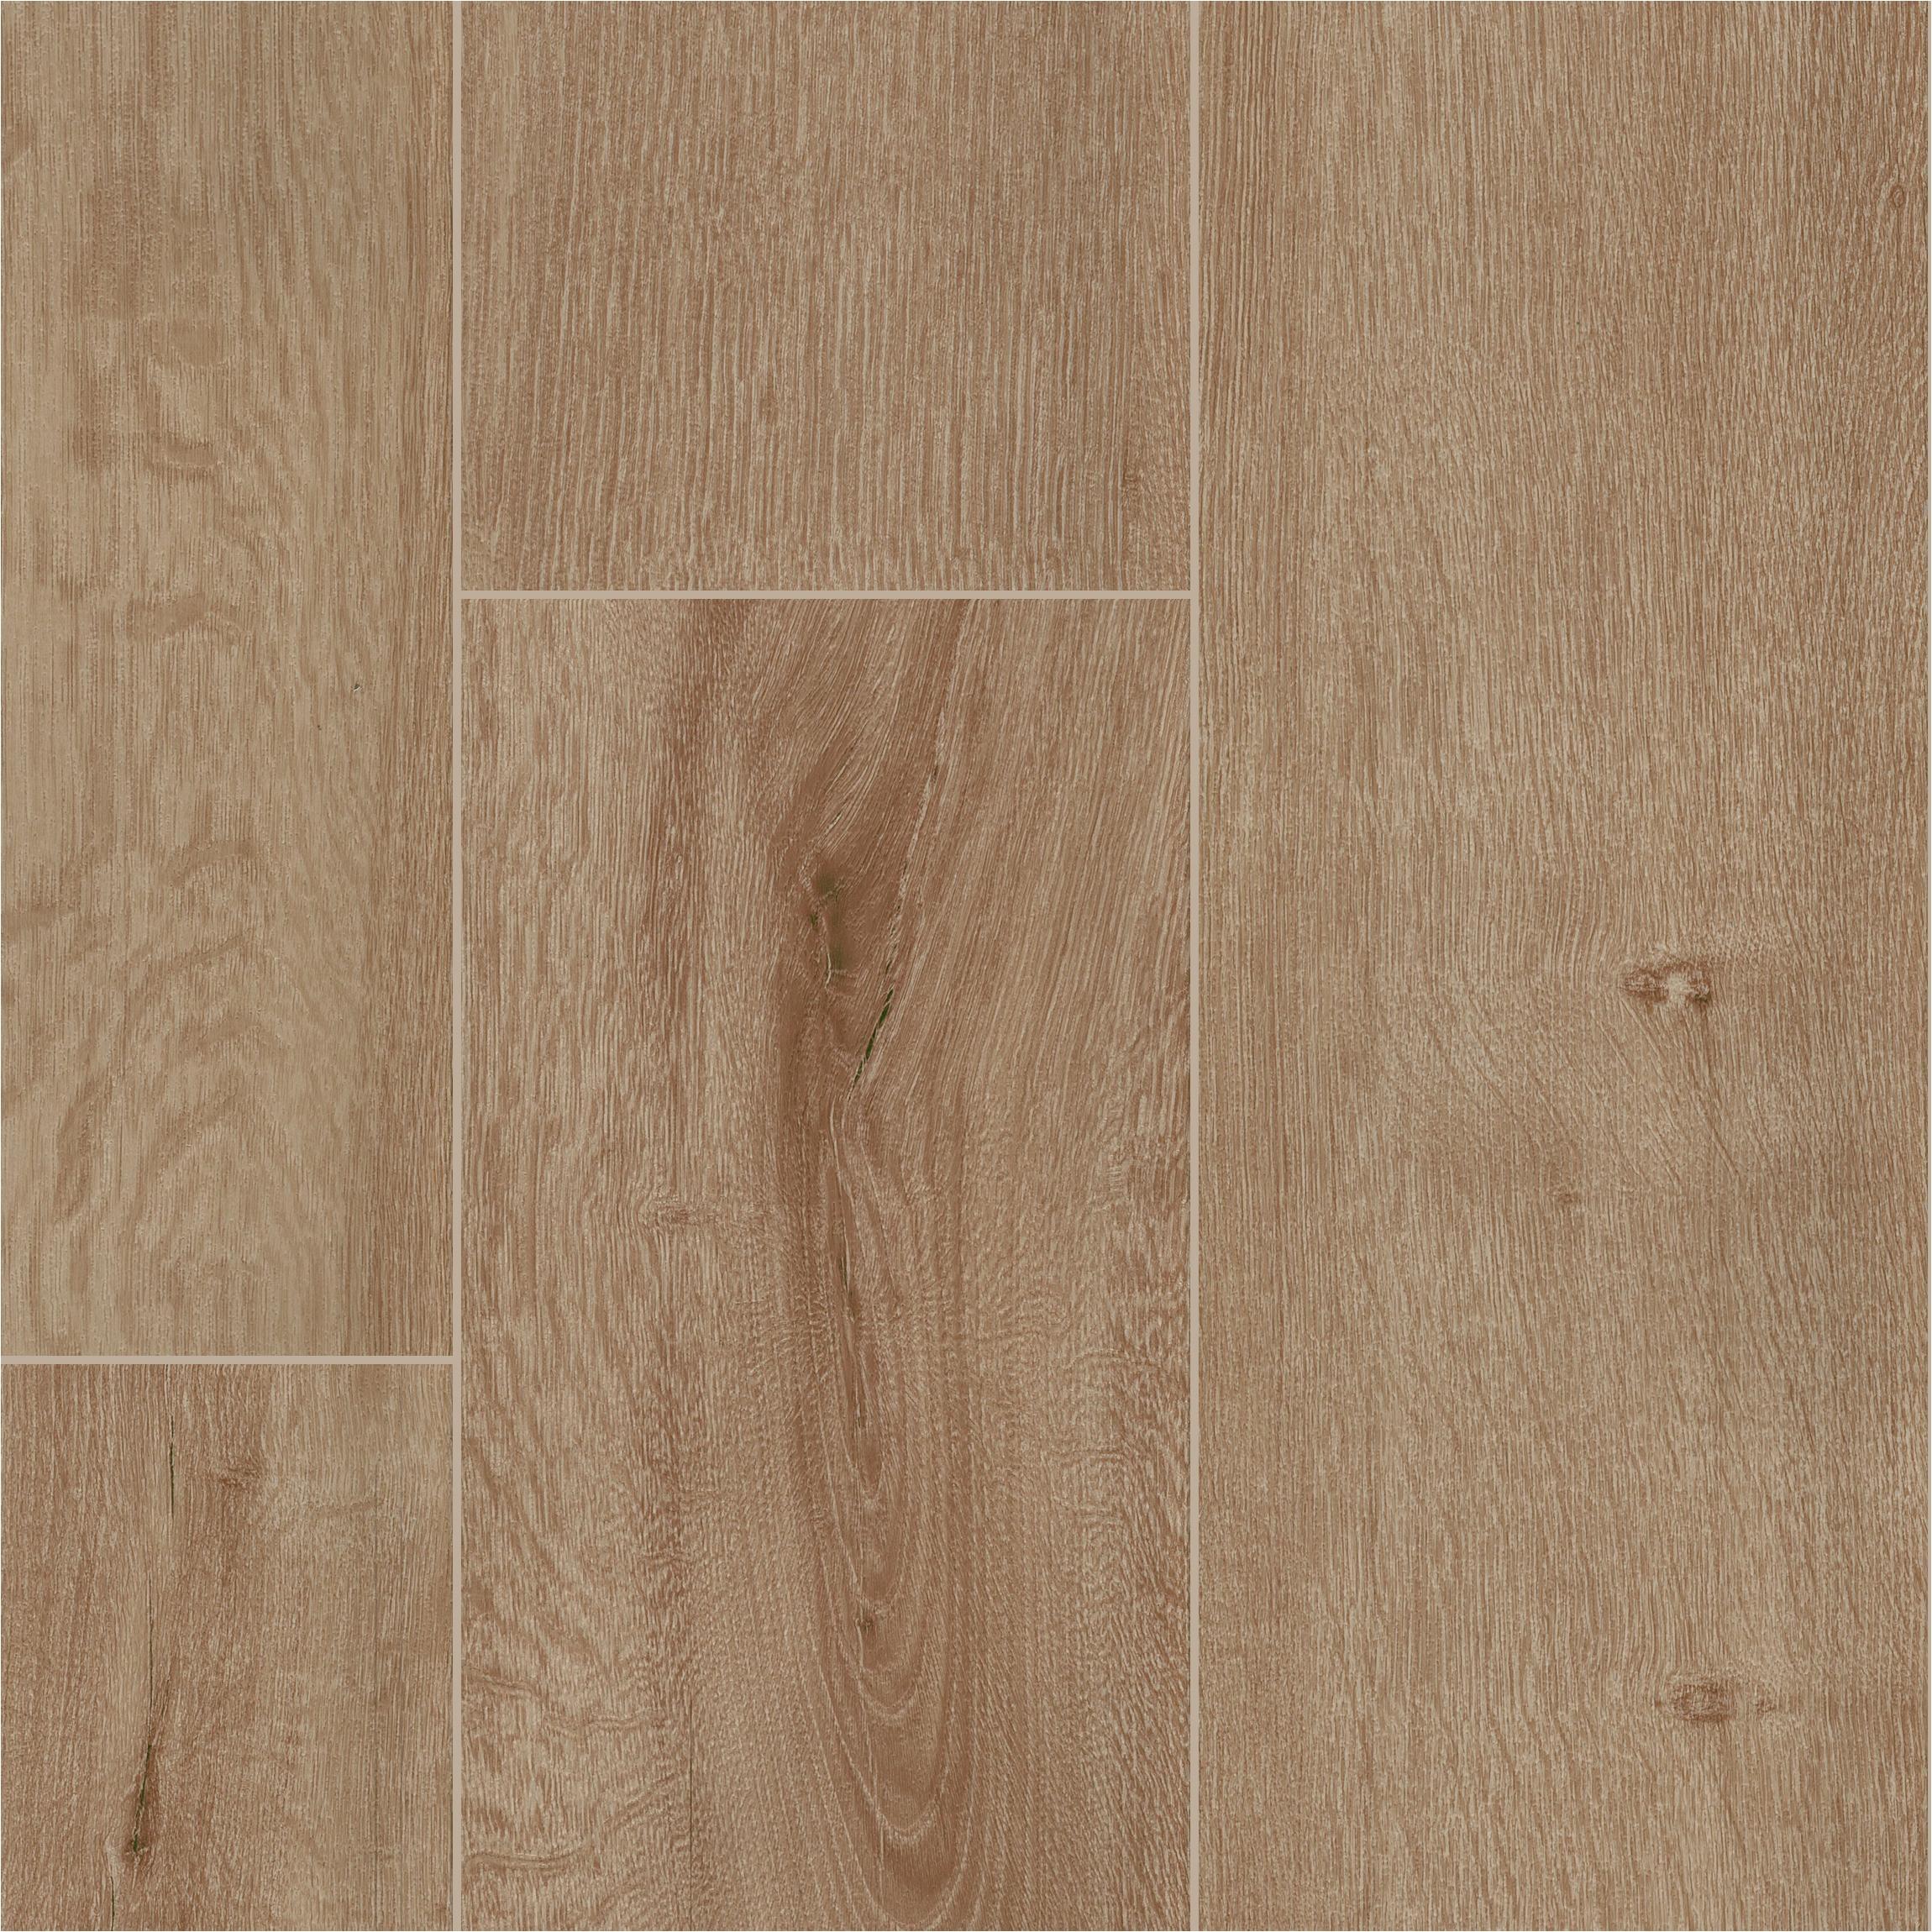 Best Luxury Vinyl Plank Flooring Brands Mohawk Beach Beige 9 Wide Glue Down Luxury Vinyl Plank Flooring